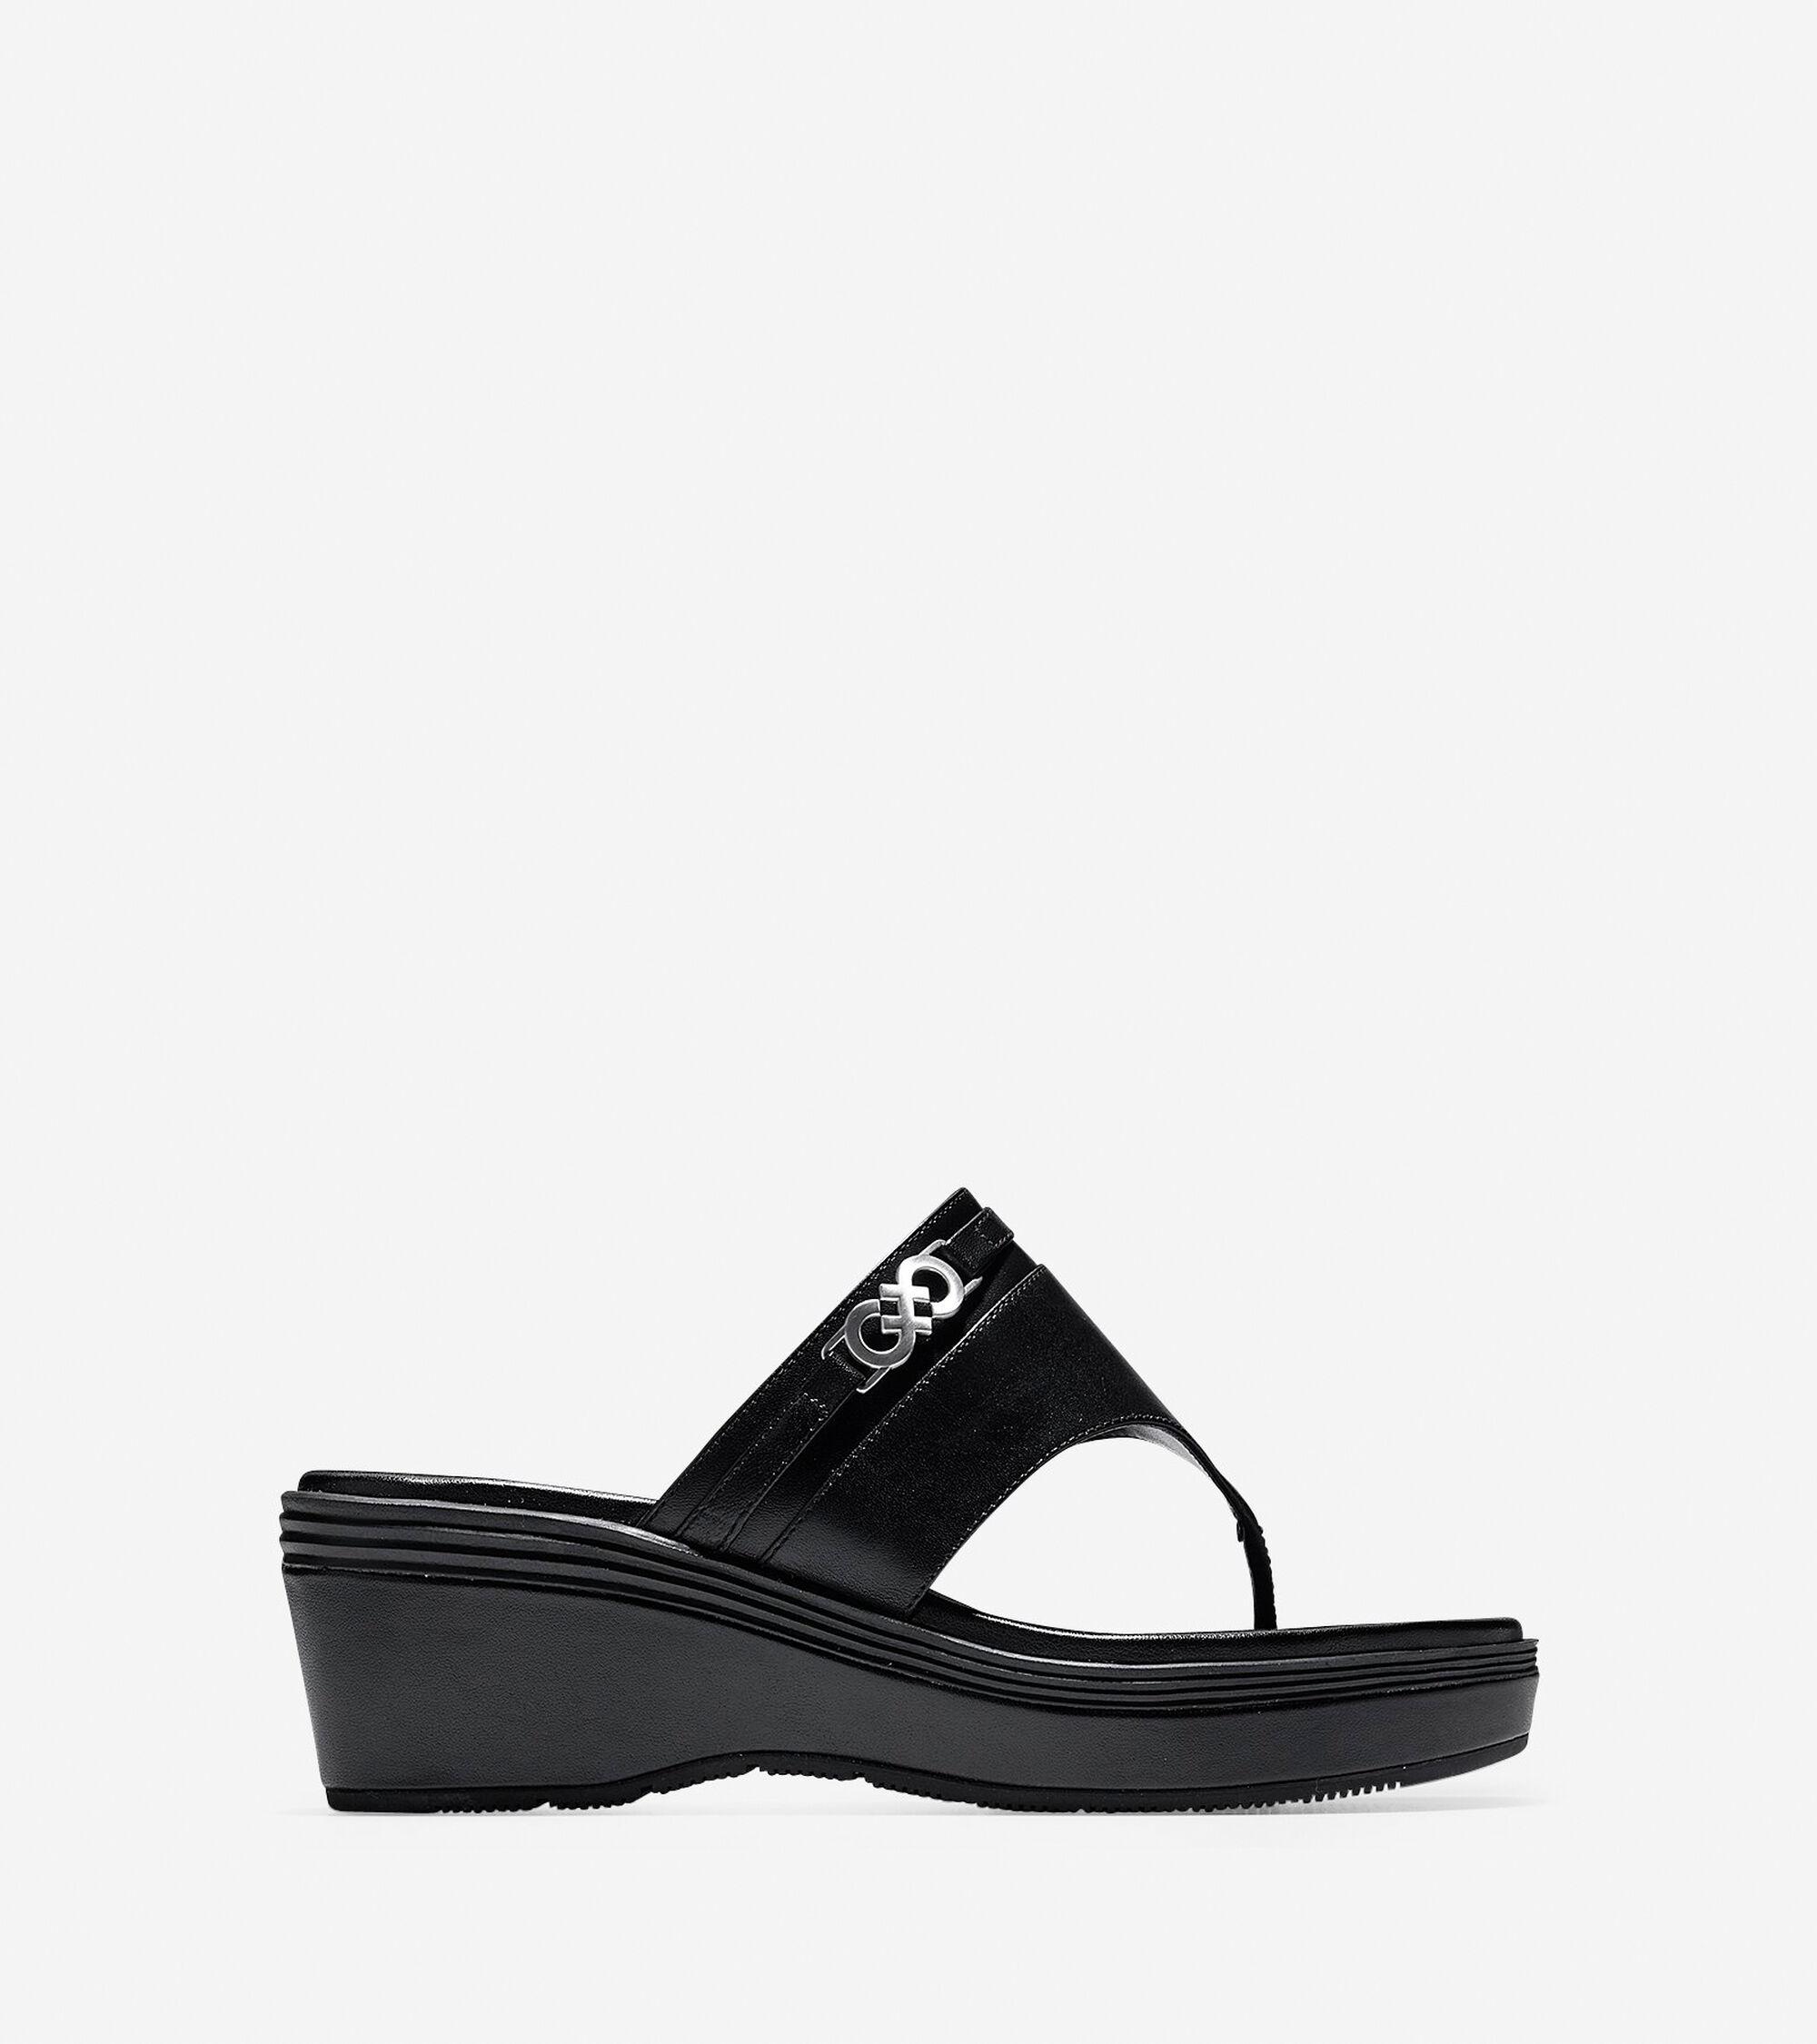 4776a19675cb8 Lindy Grand Thong Sandals in Black-Black